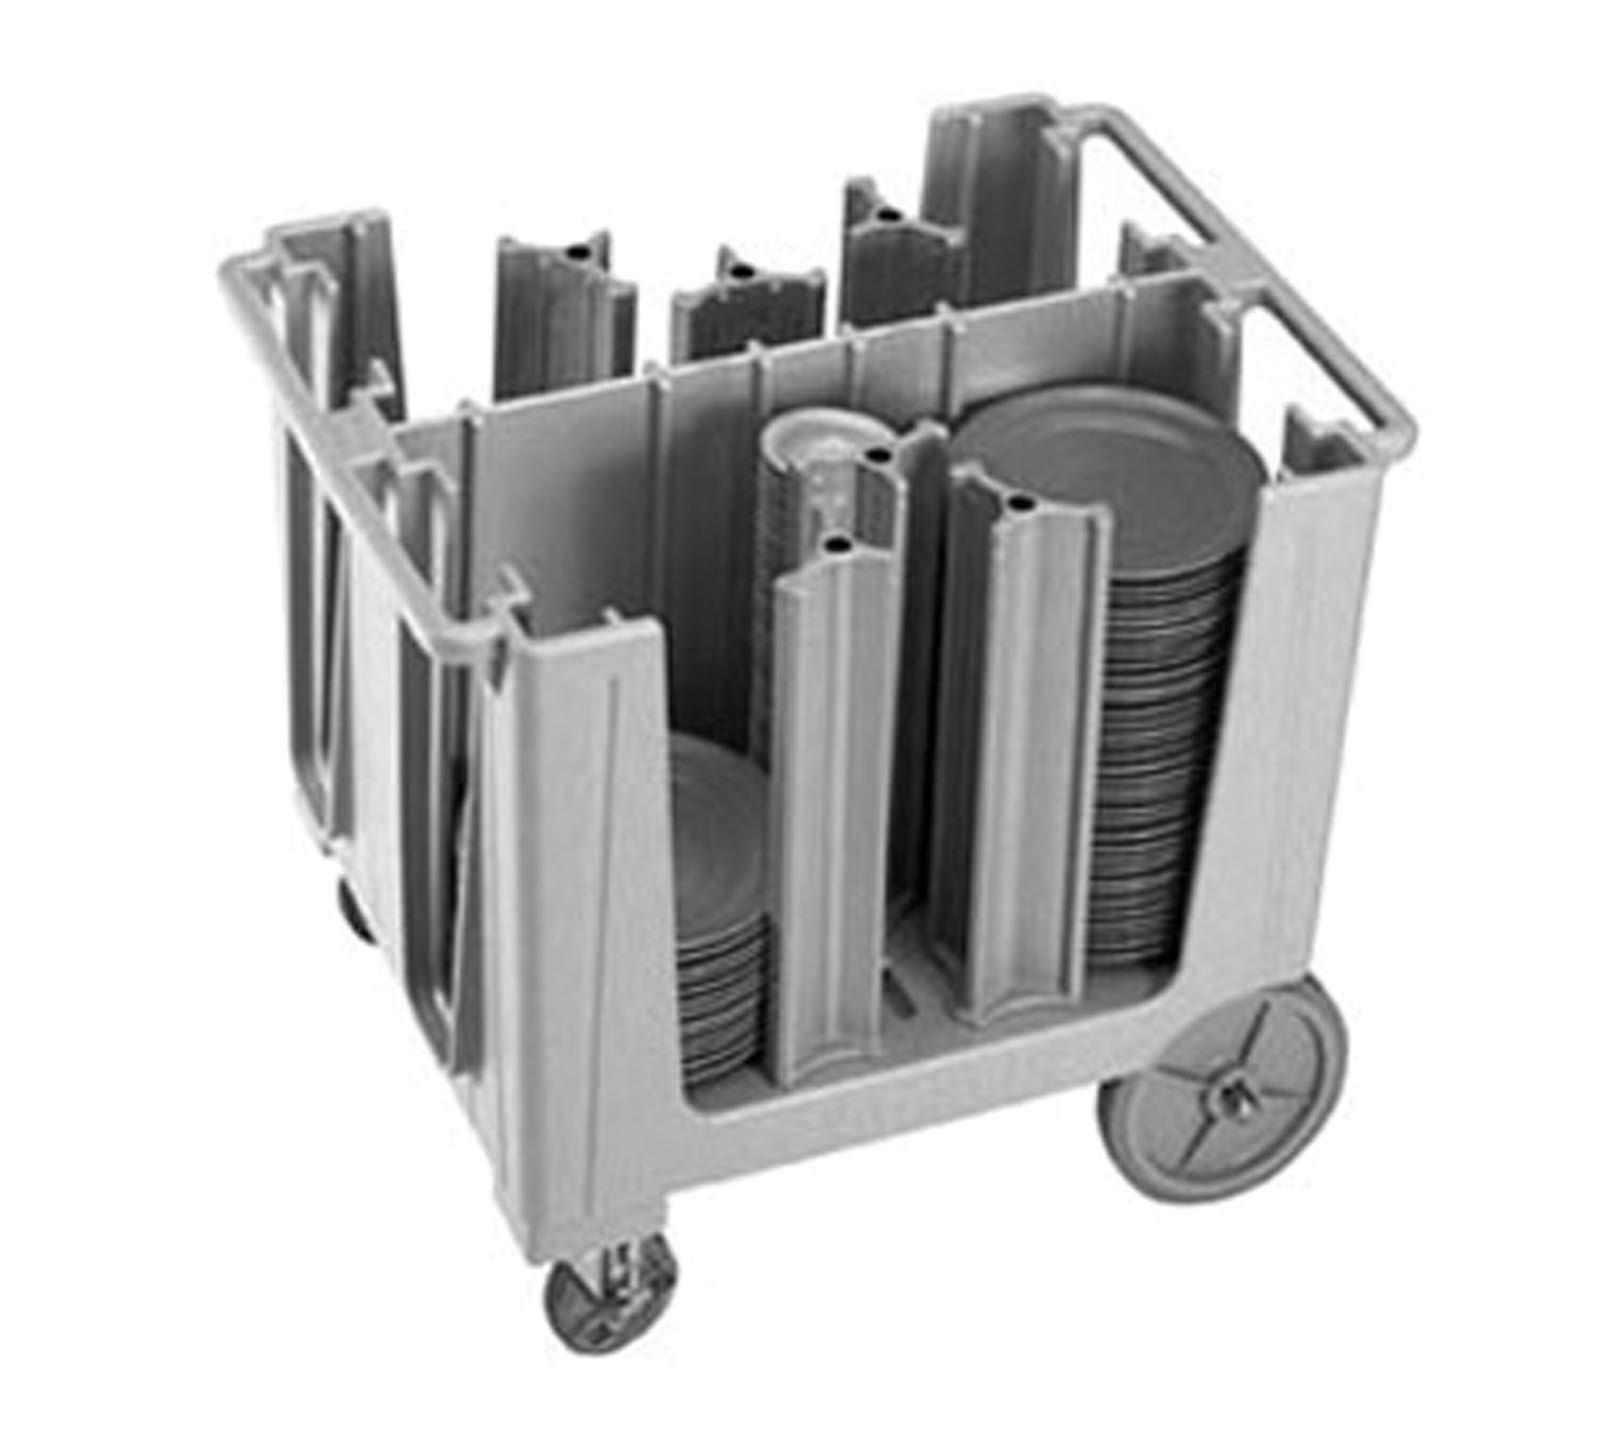 Cambro (ADCS401) Plastic Adjustable Dish Caddy